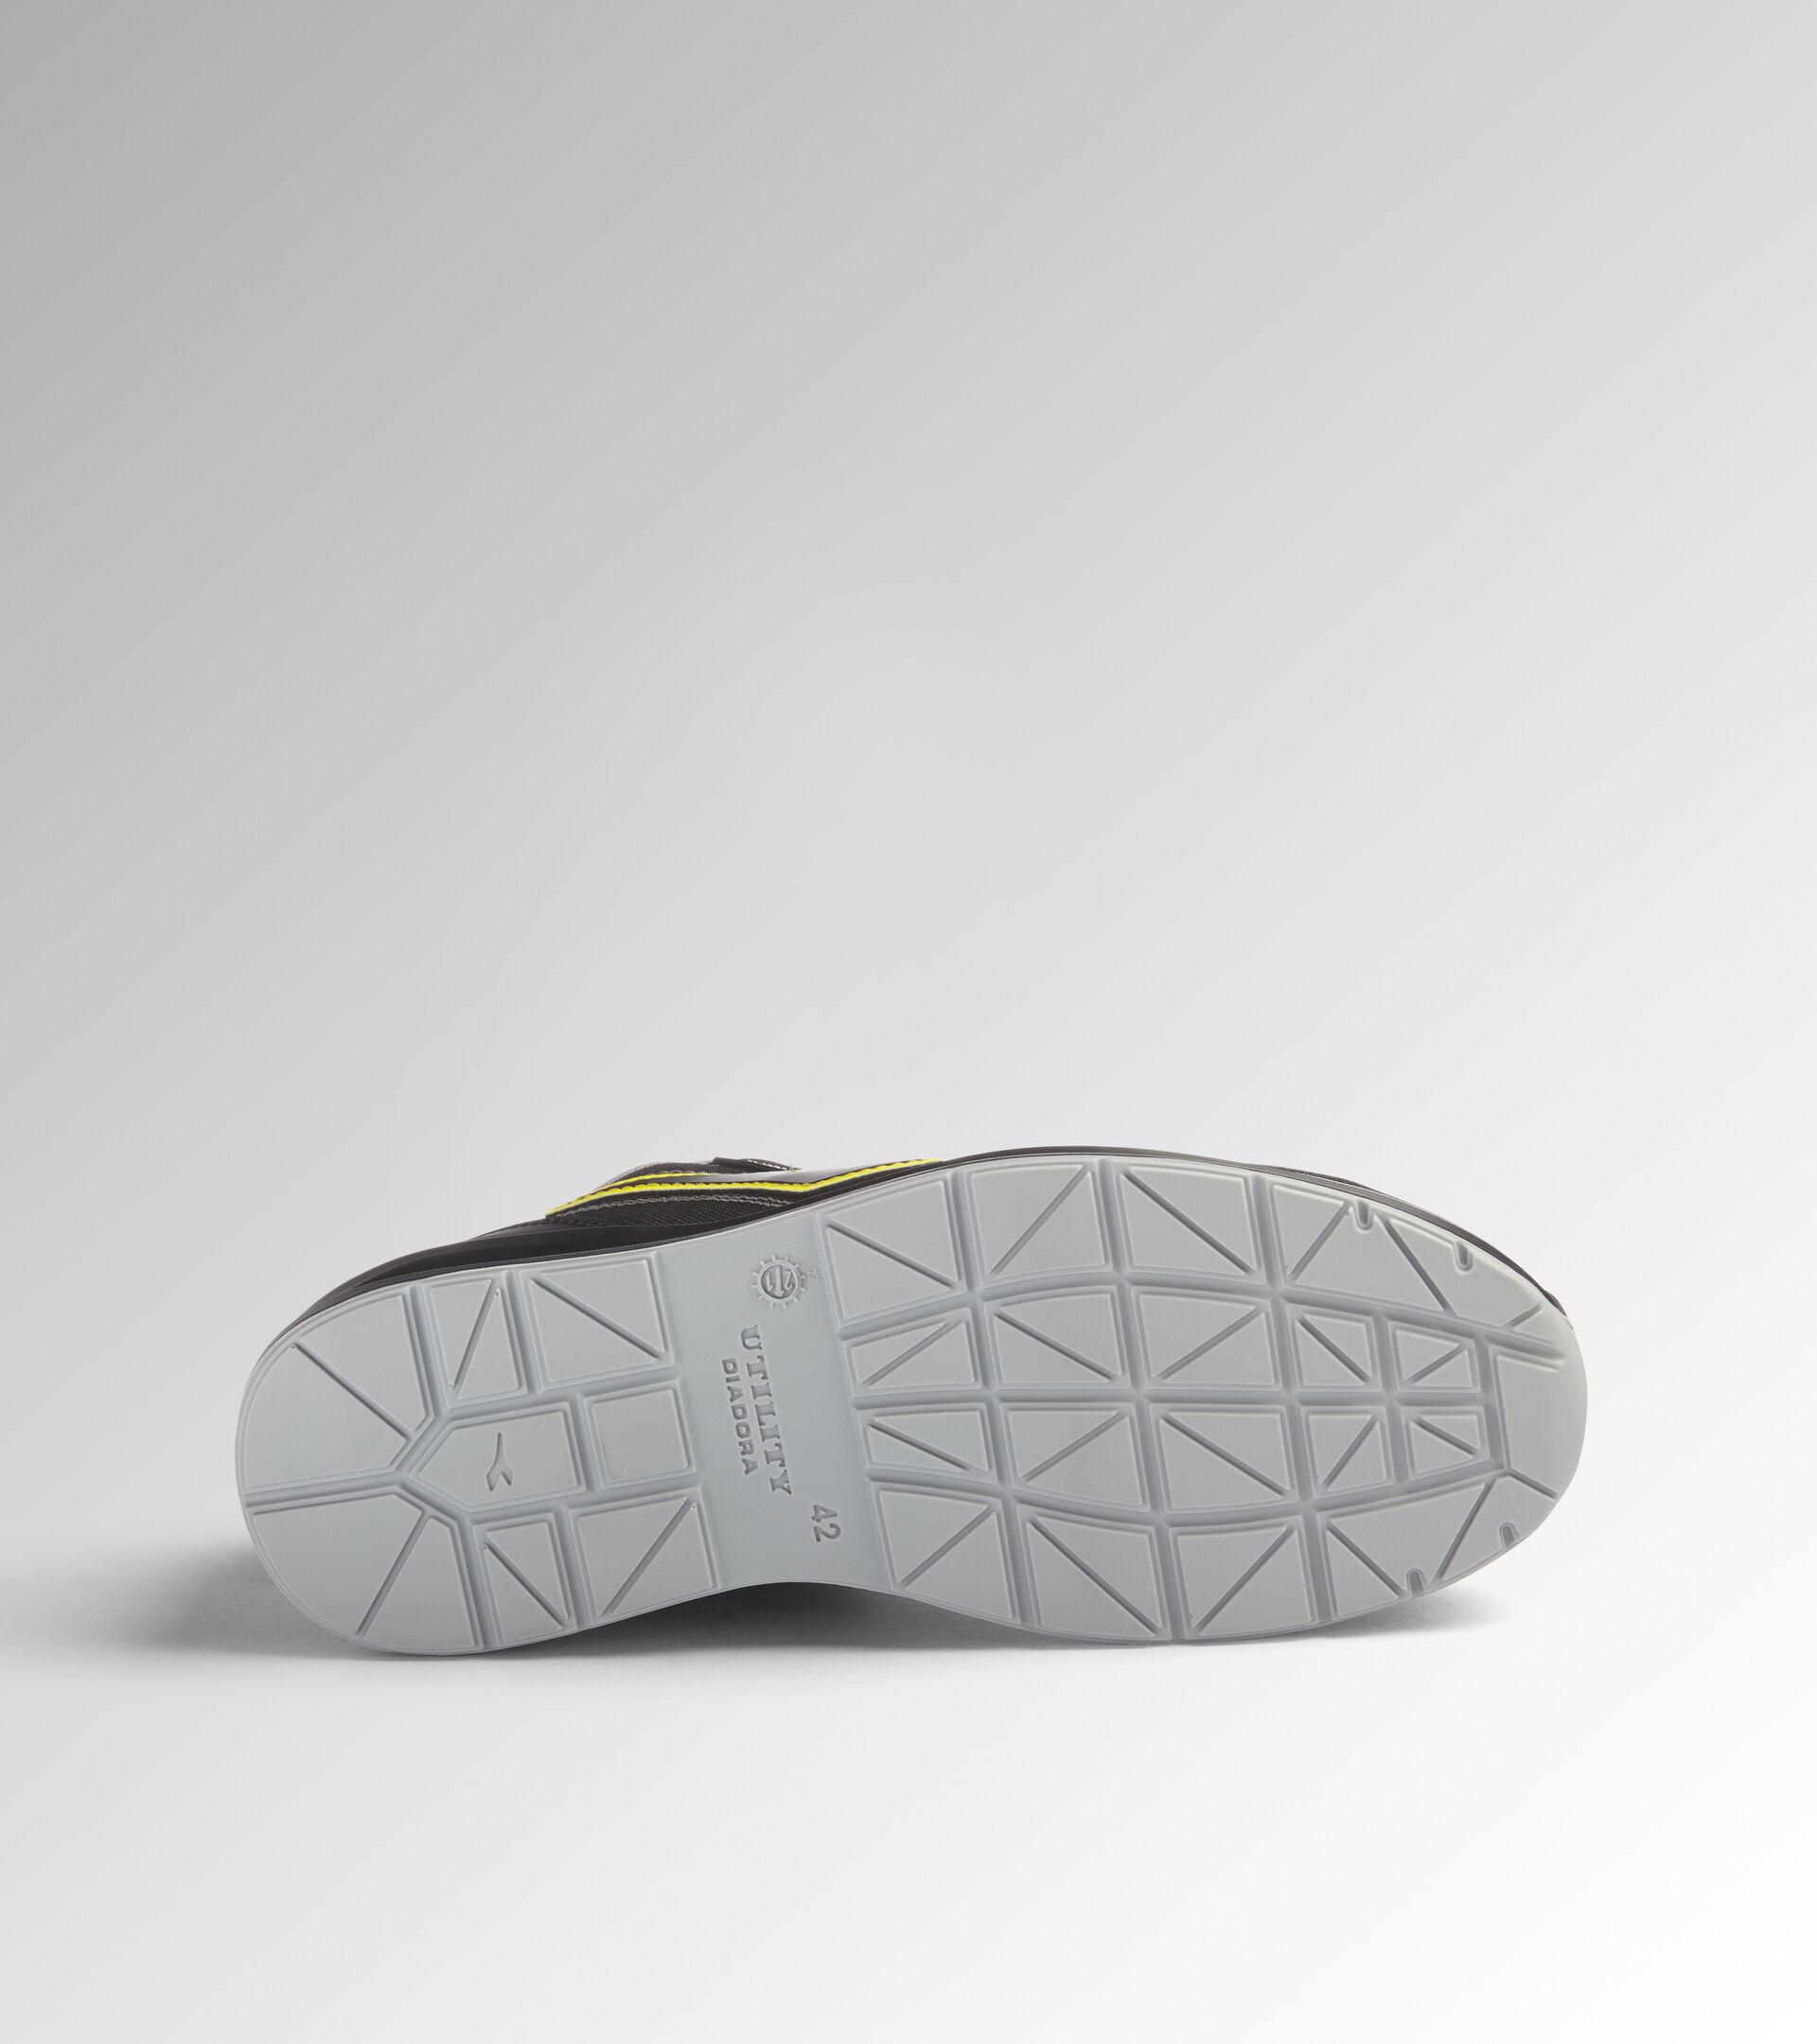 Footwear Utility UNISEX RUN NET AIRBOX MATRYX LOW S3 SRC BLACK /BLACK Utility